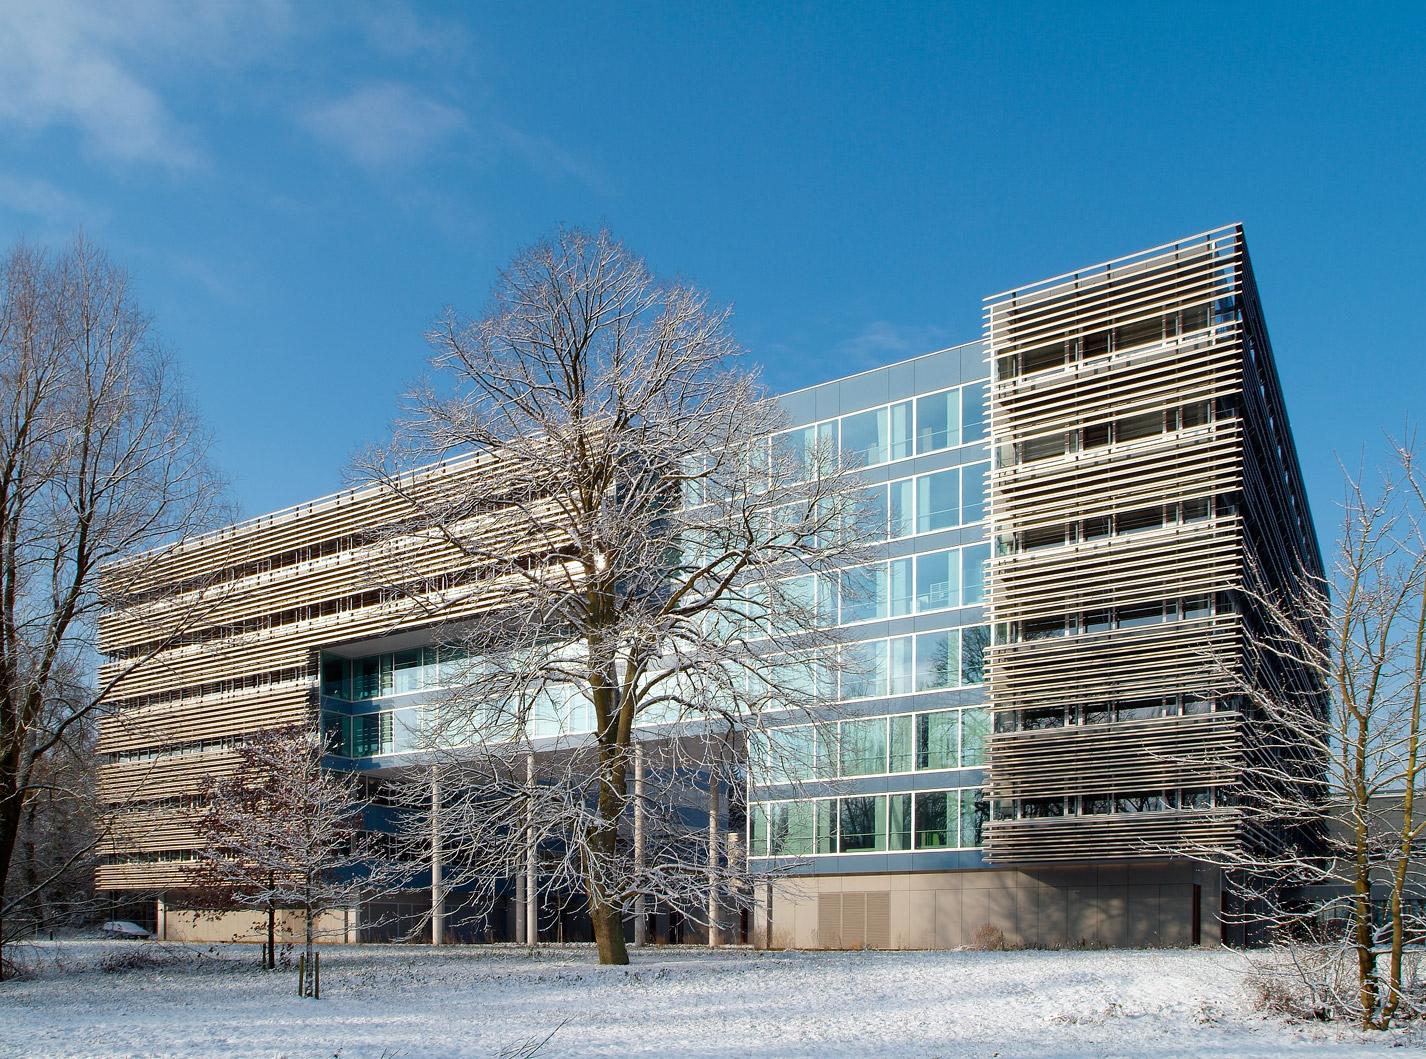 Belastingdienst Kantoor Rotterdam : Belastingdienst kantoor rotterdam inspiration